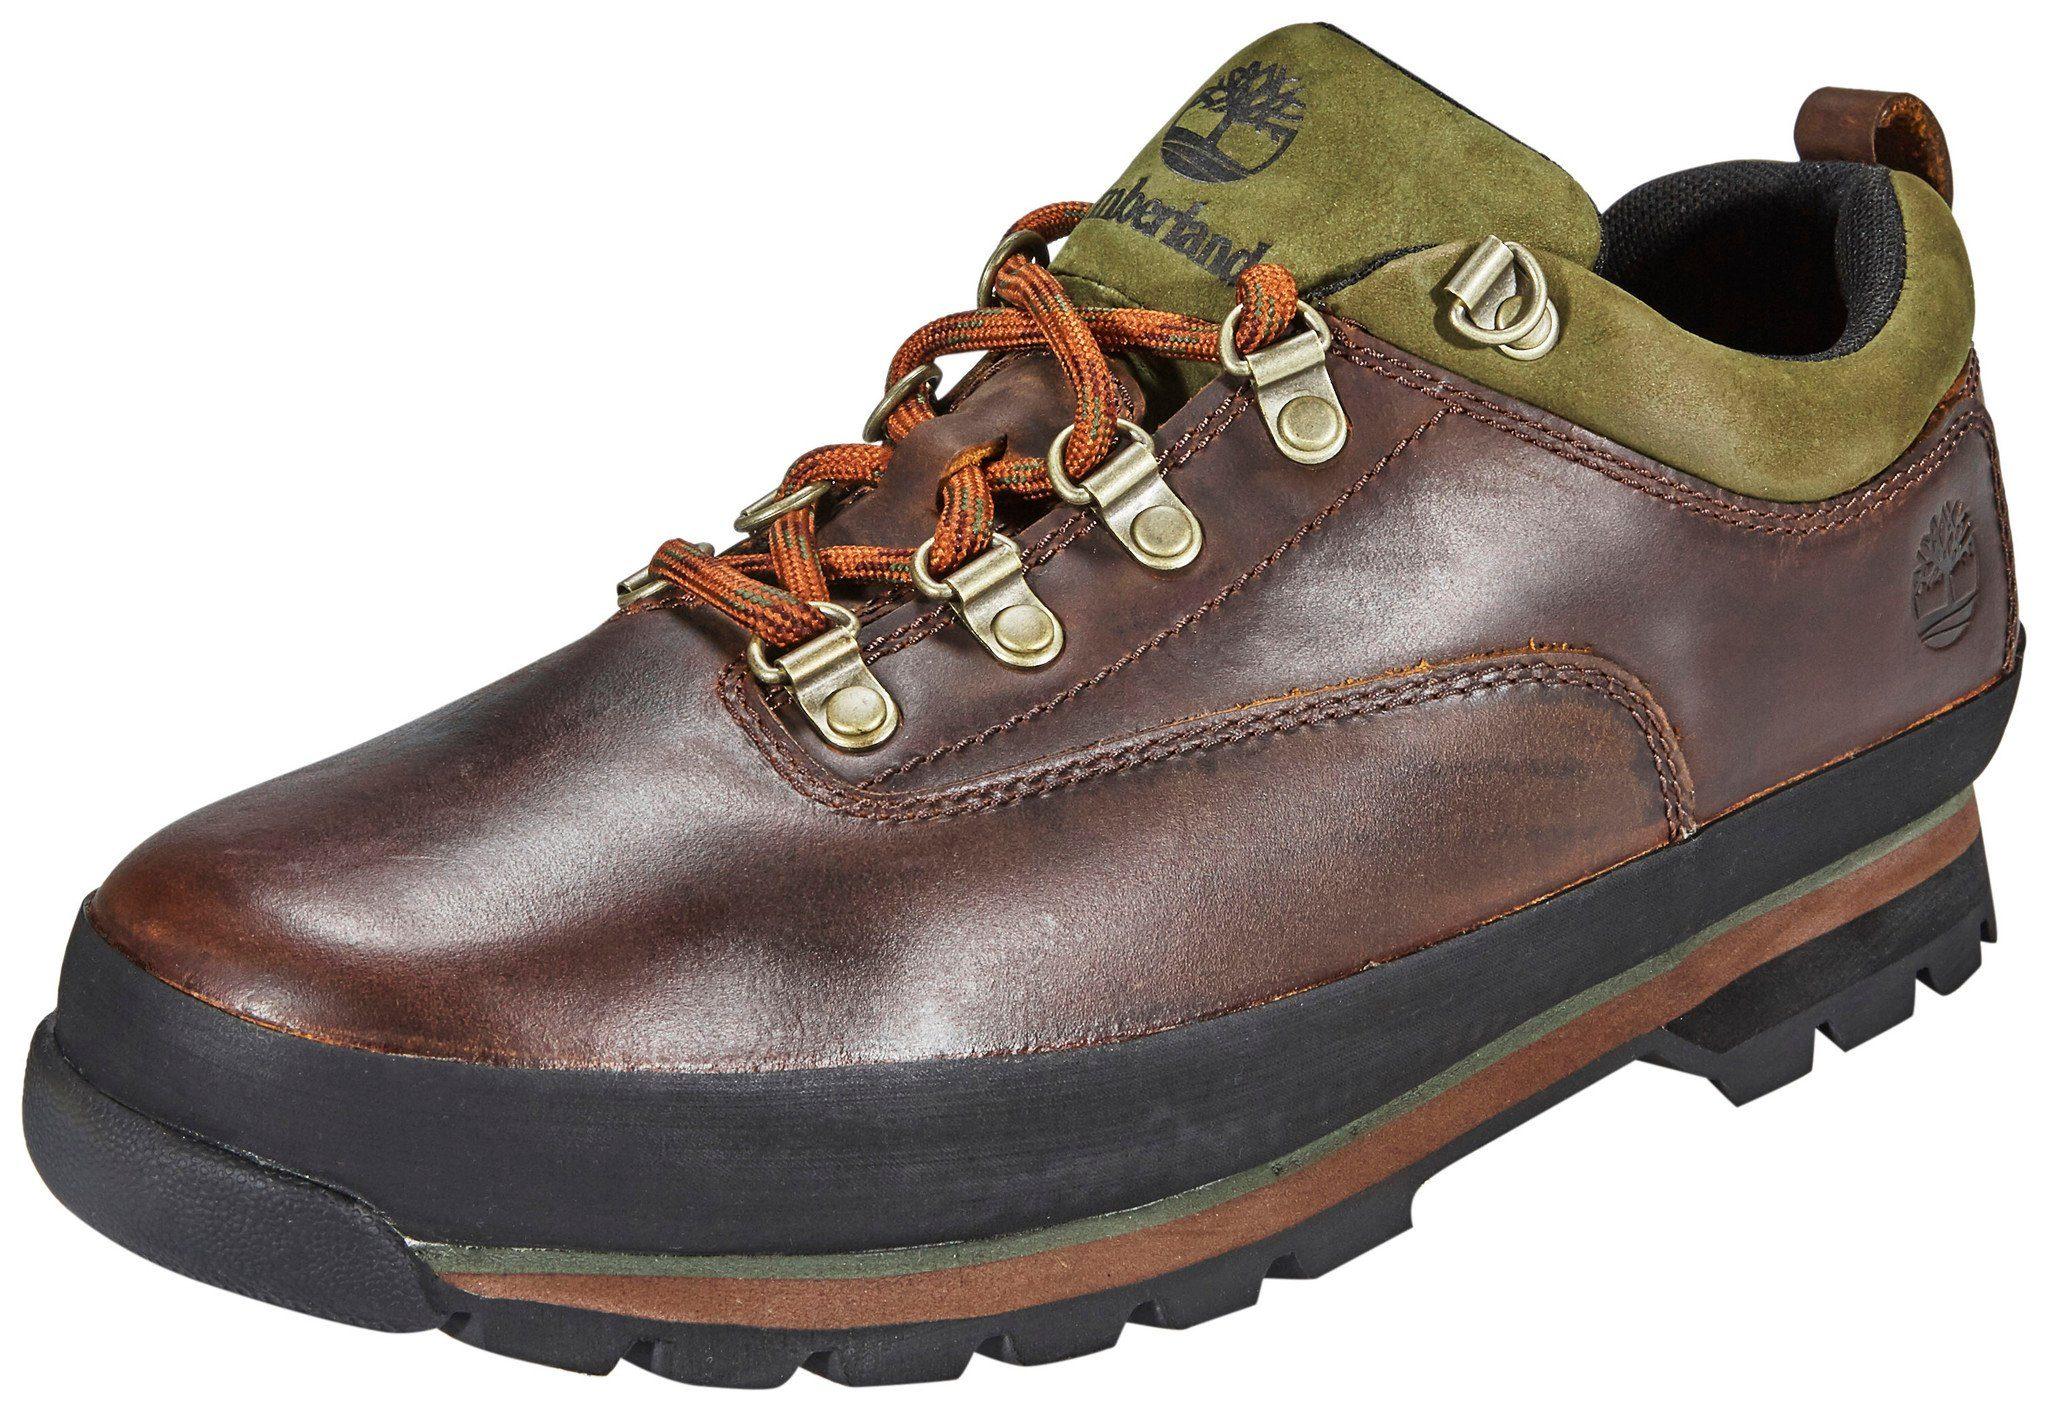 Timberland Kletterschuh »Euro Hiker Shoes Men Low«